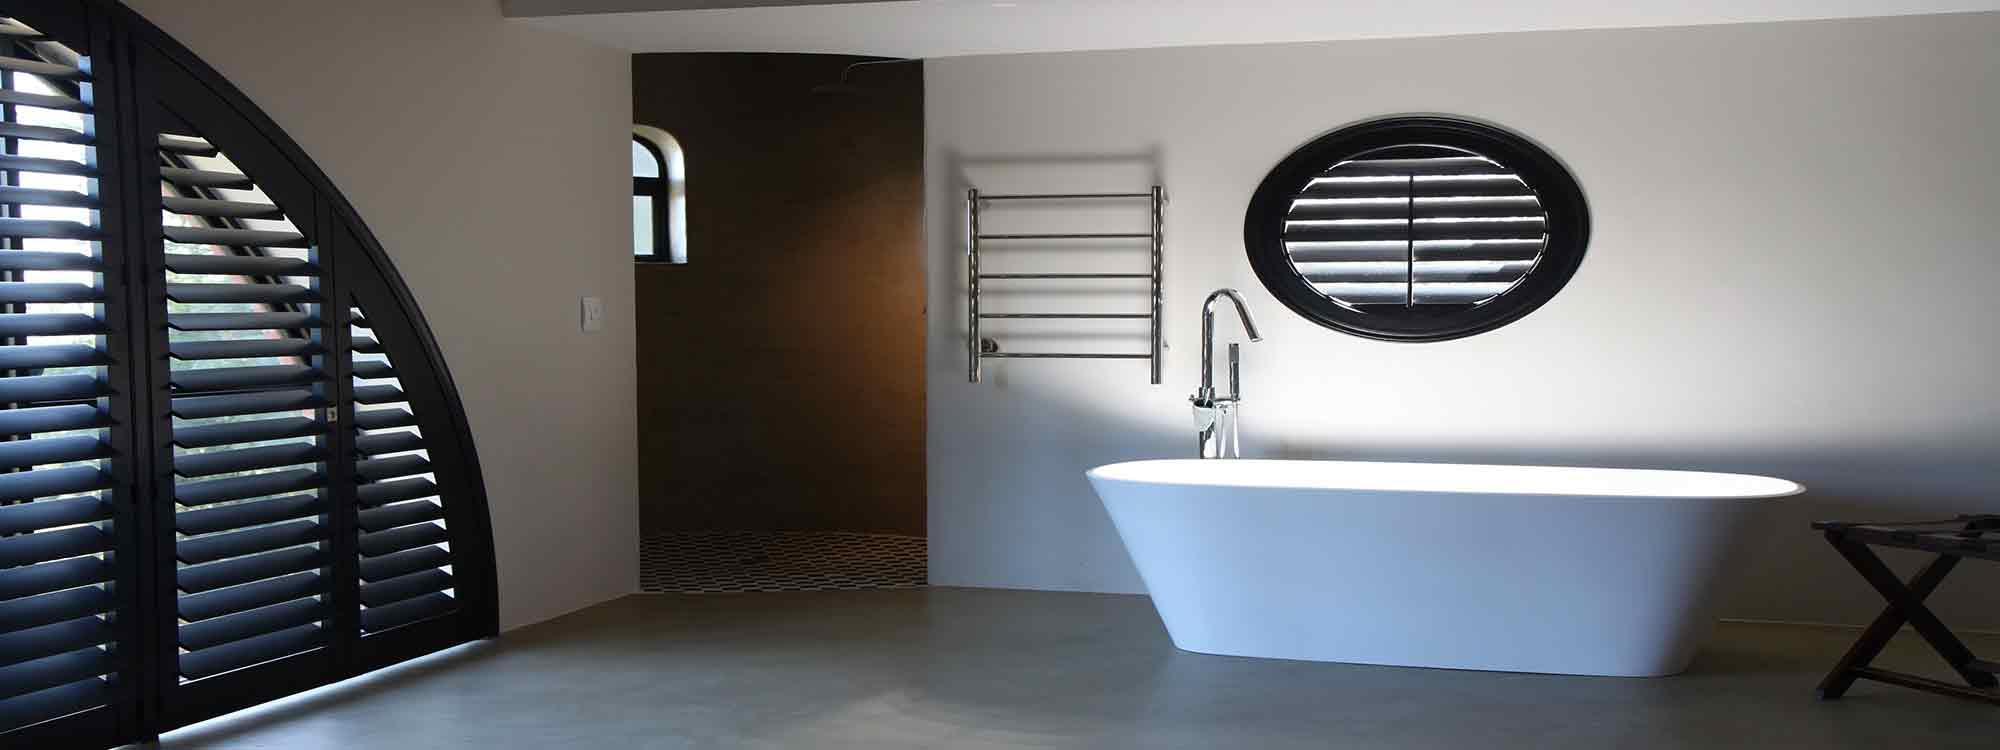 Normandy-bathroom-shutters